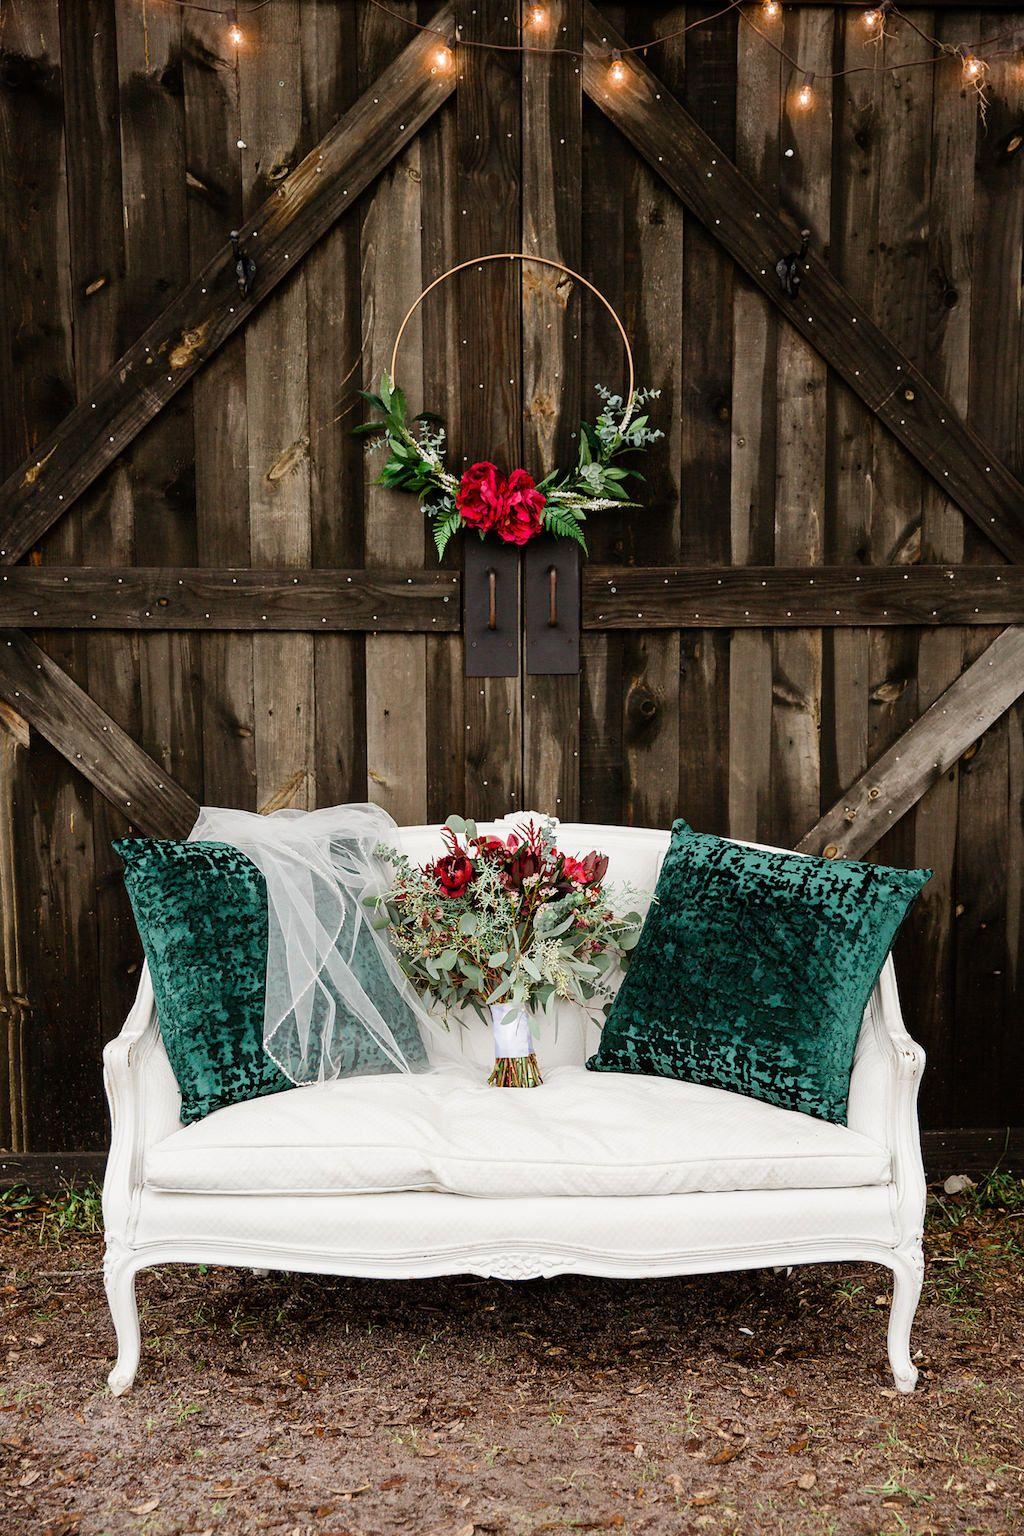 Elegant Vintage Meets Rustic Red and Pink Wedding | The Orange Blossom Barn